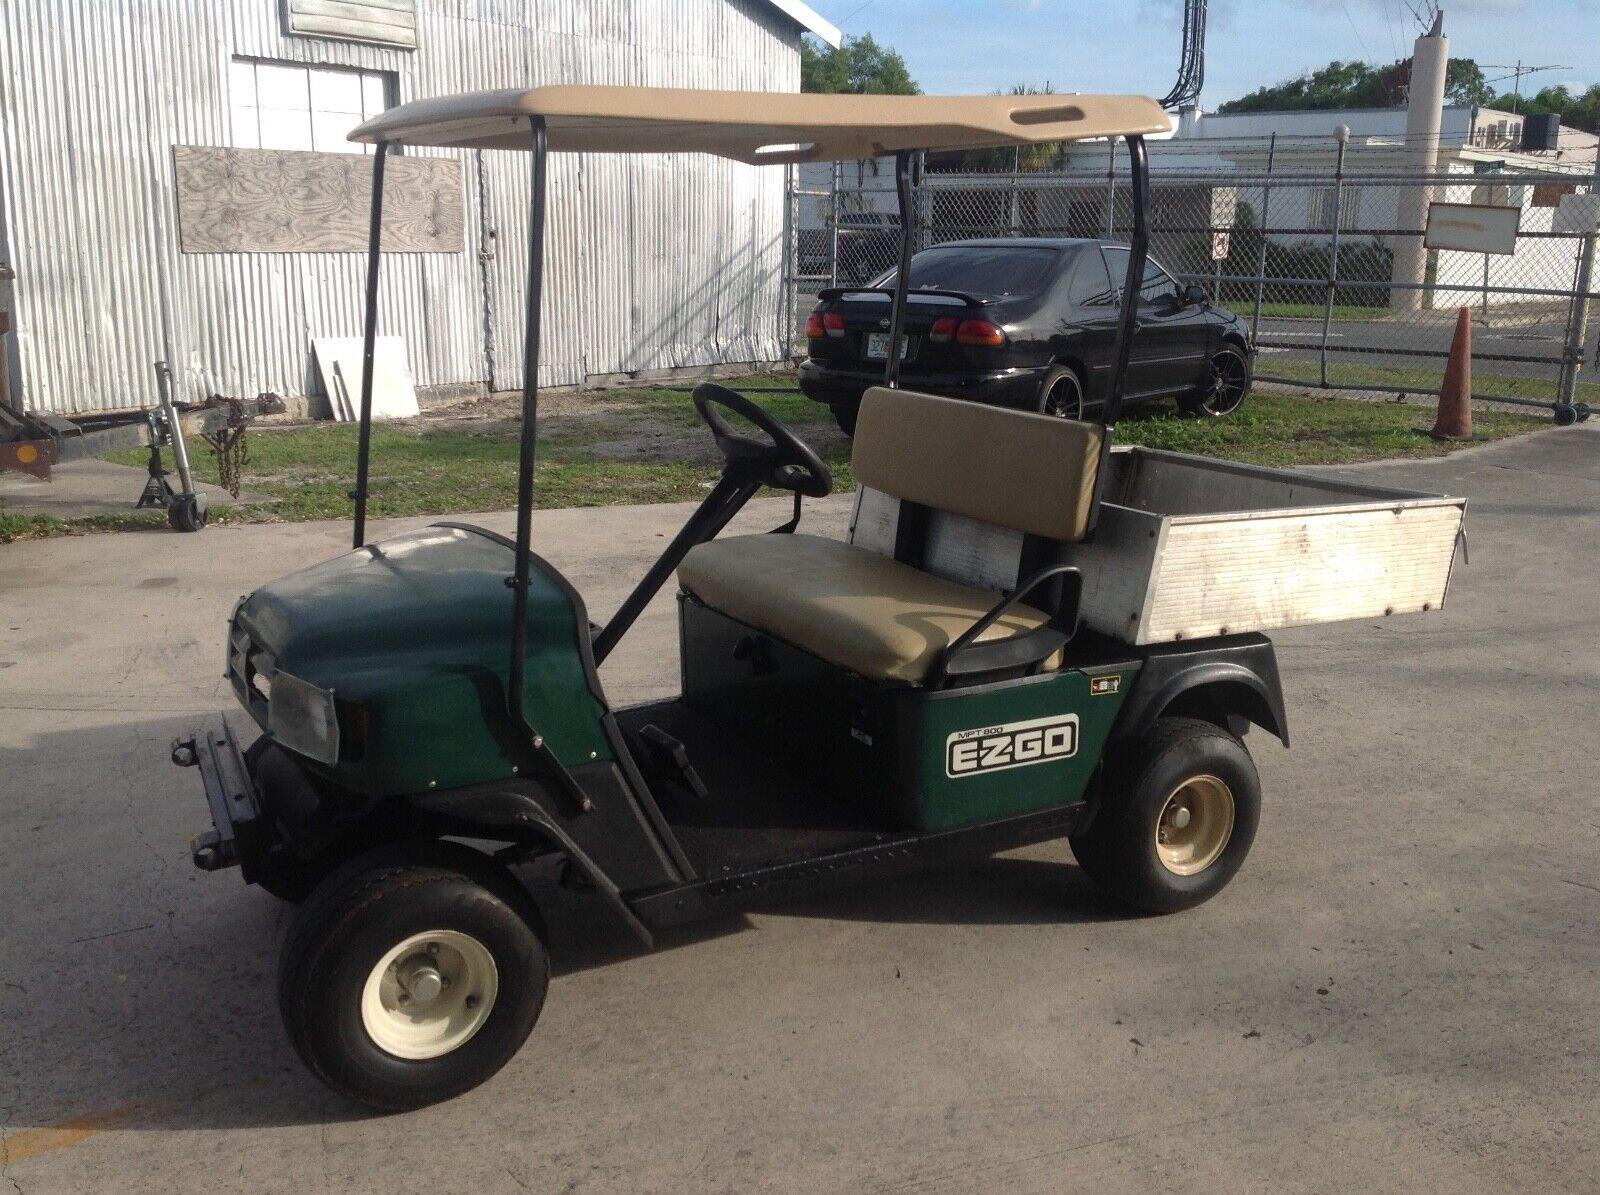 Ezgo utility mpt 800 gas green cargo bed box golf cart